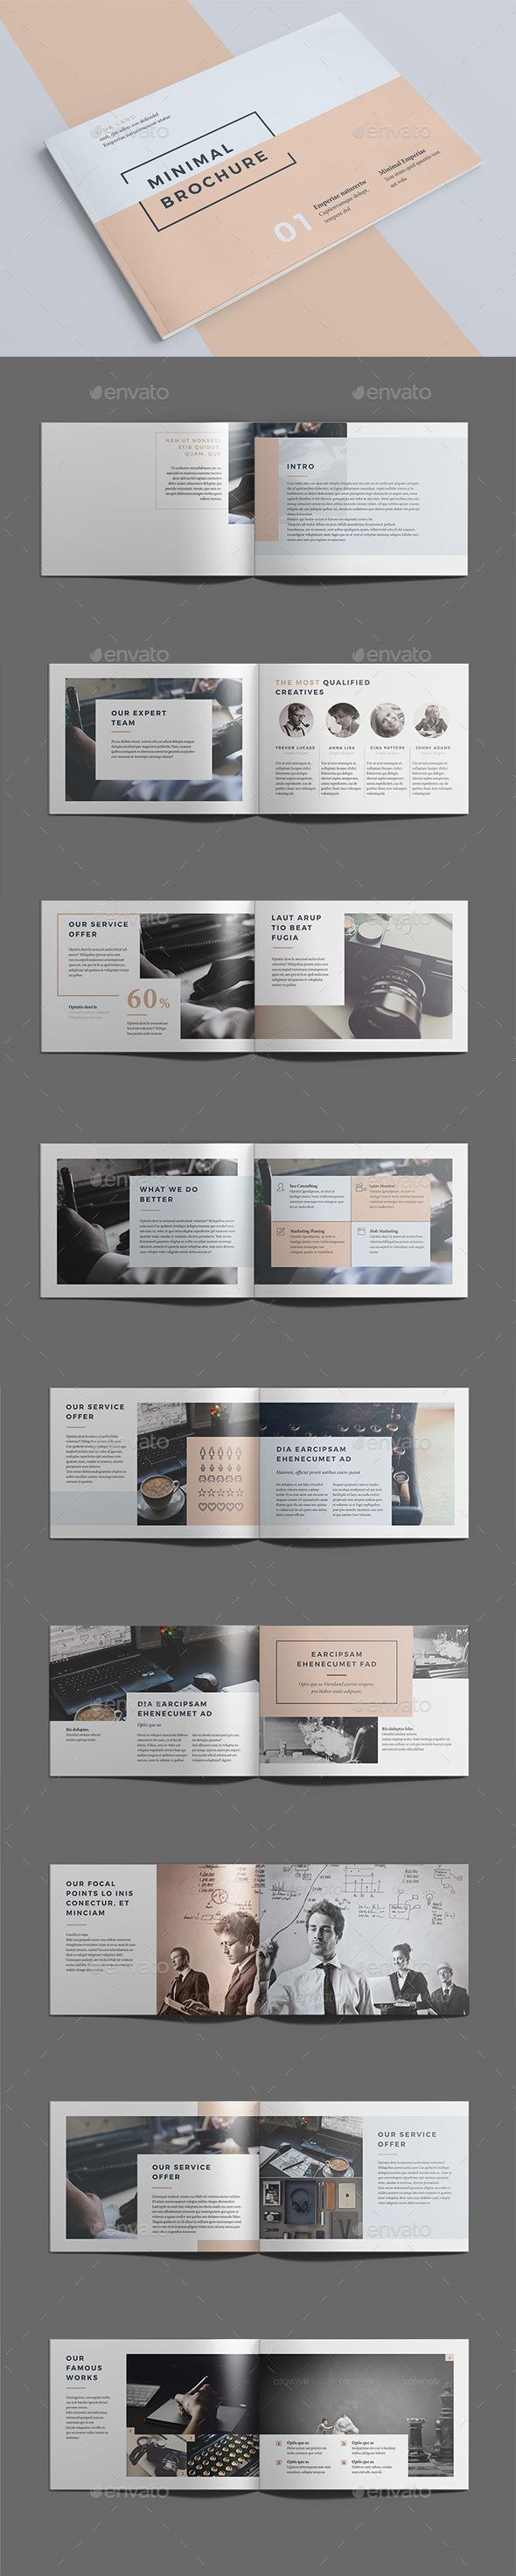 Minimal Brochure Template InDesign INDD. Download here: